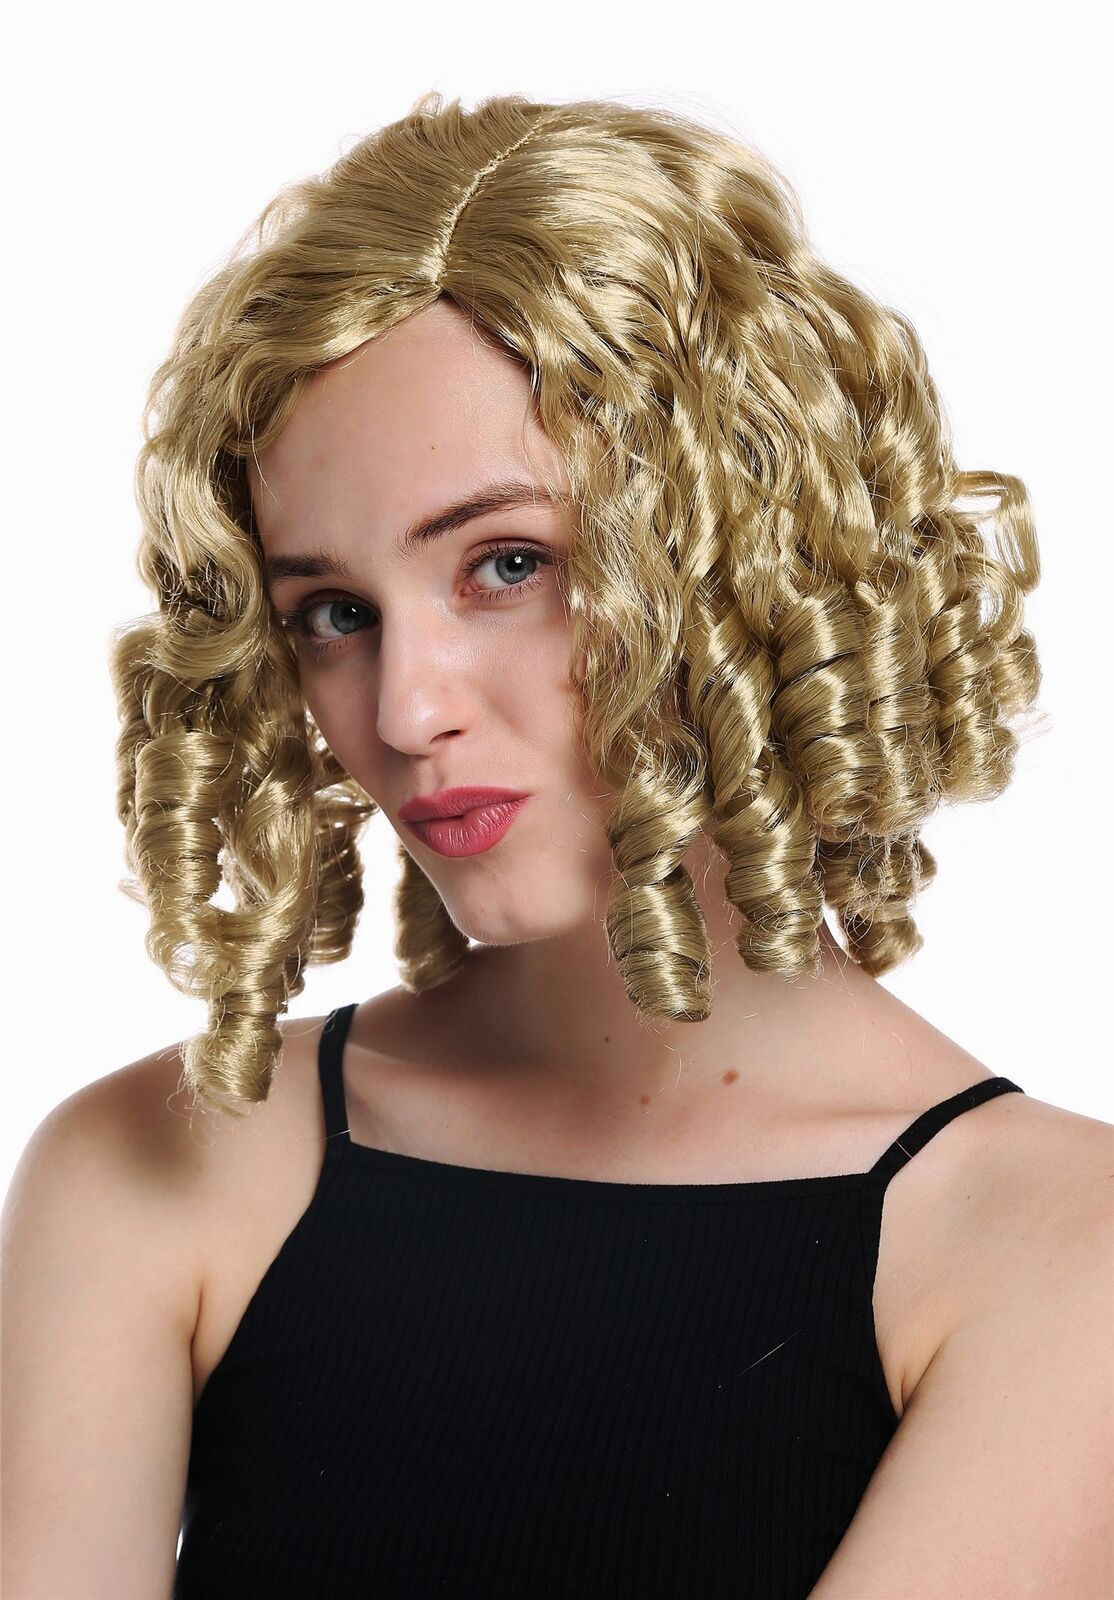 Wig Ladies Carnival Baroque Gothic Lolita Cosplay Corkscrew-Curl Grey